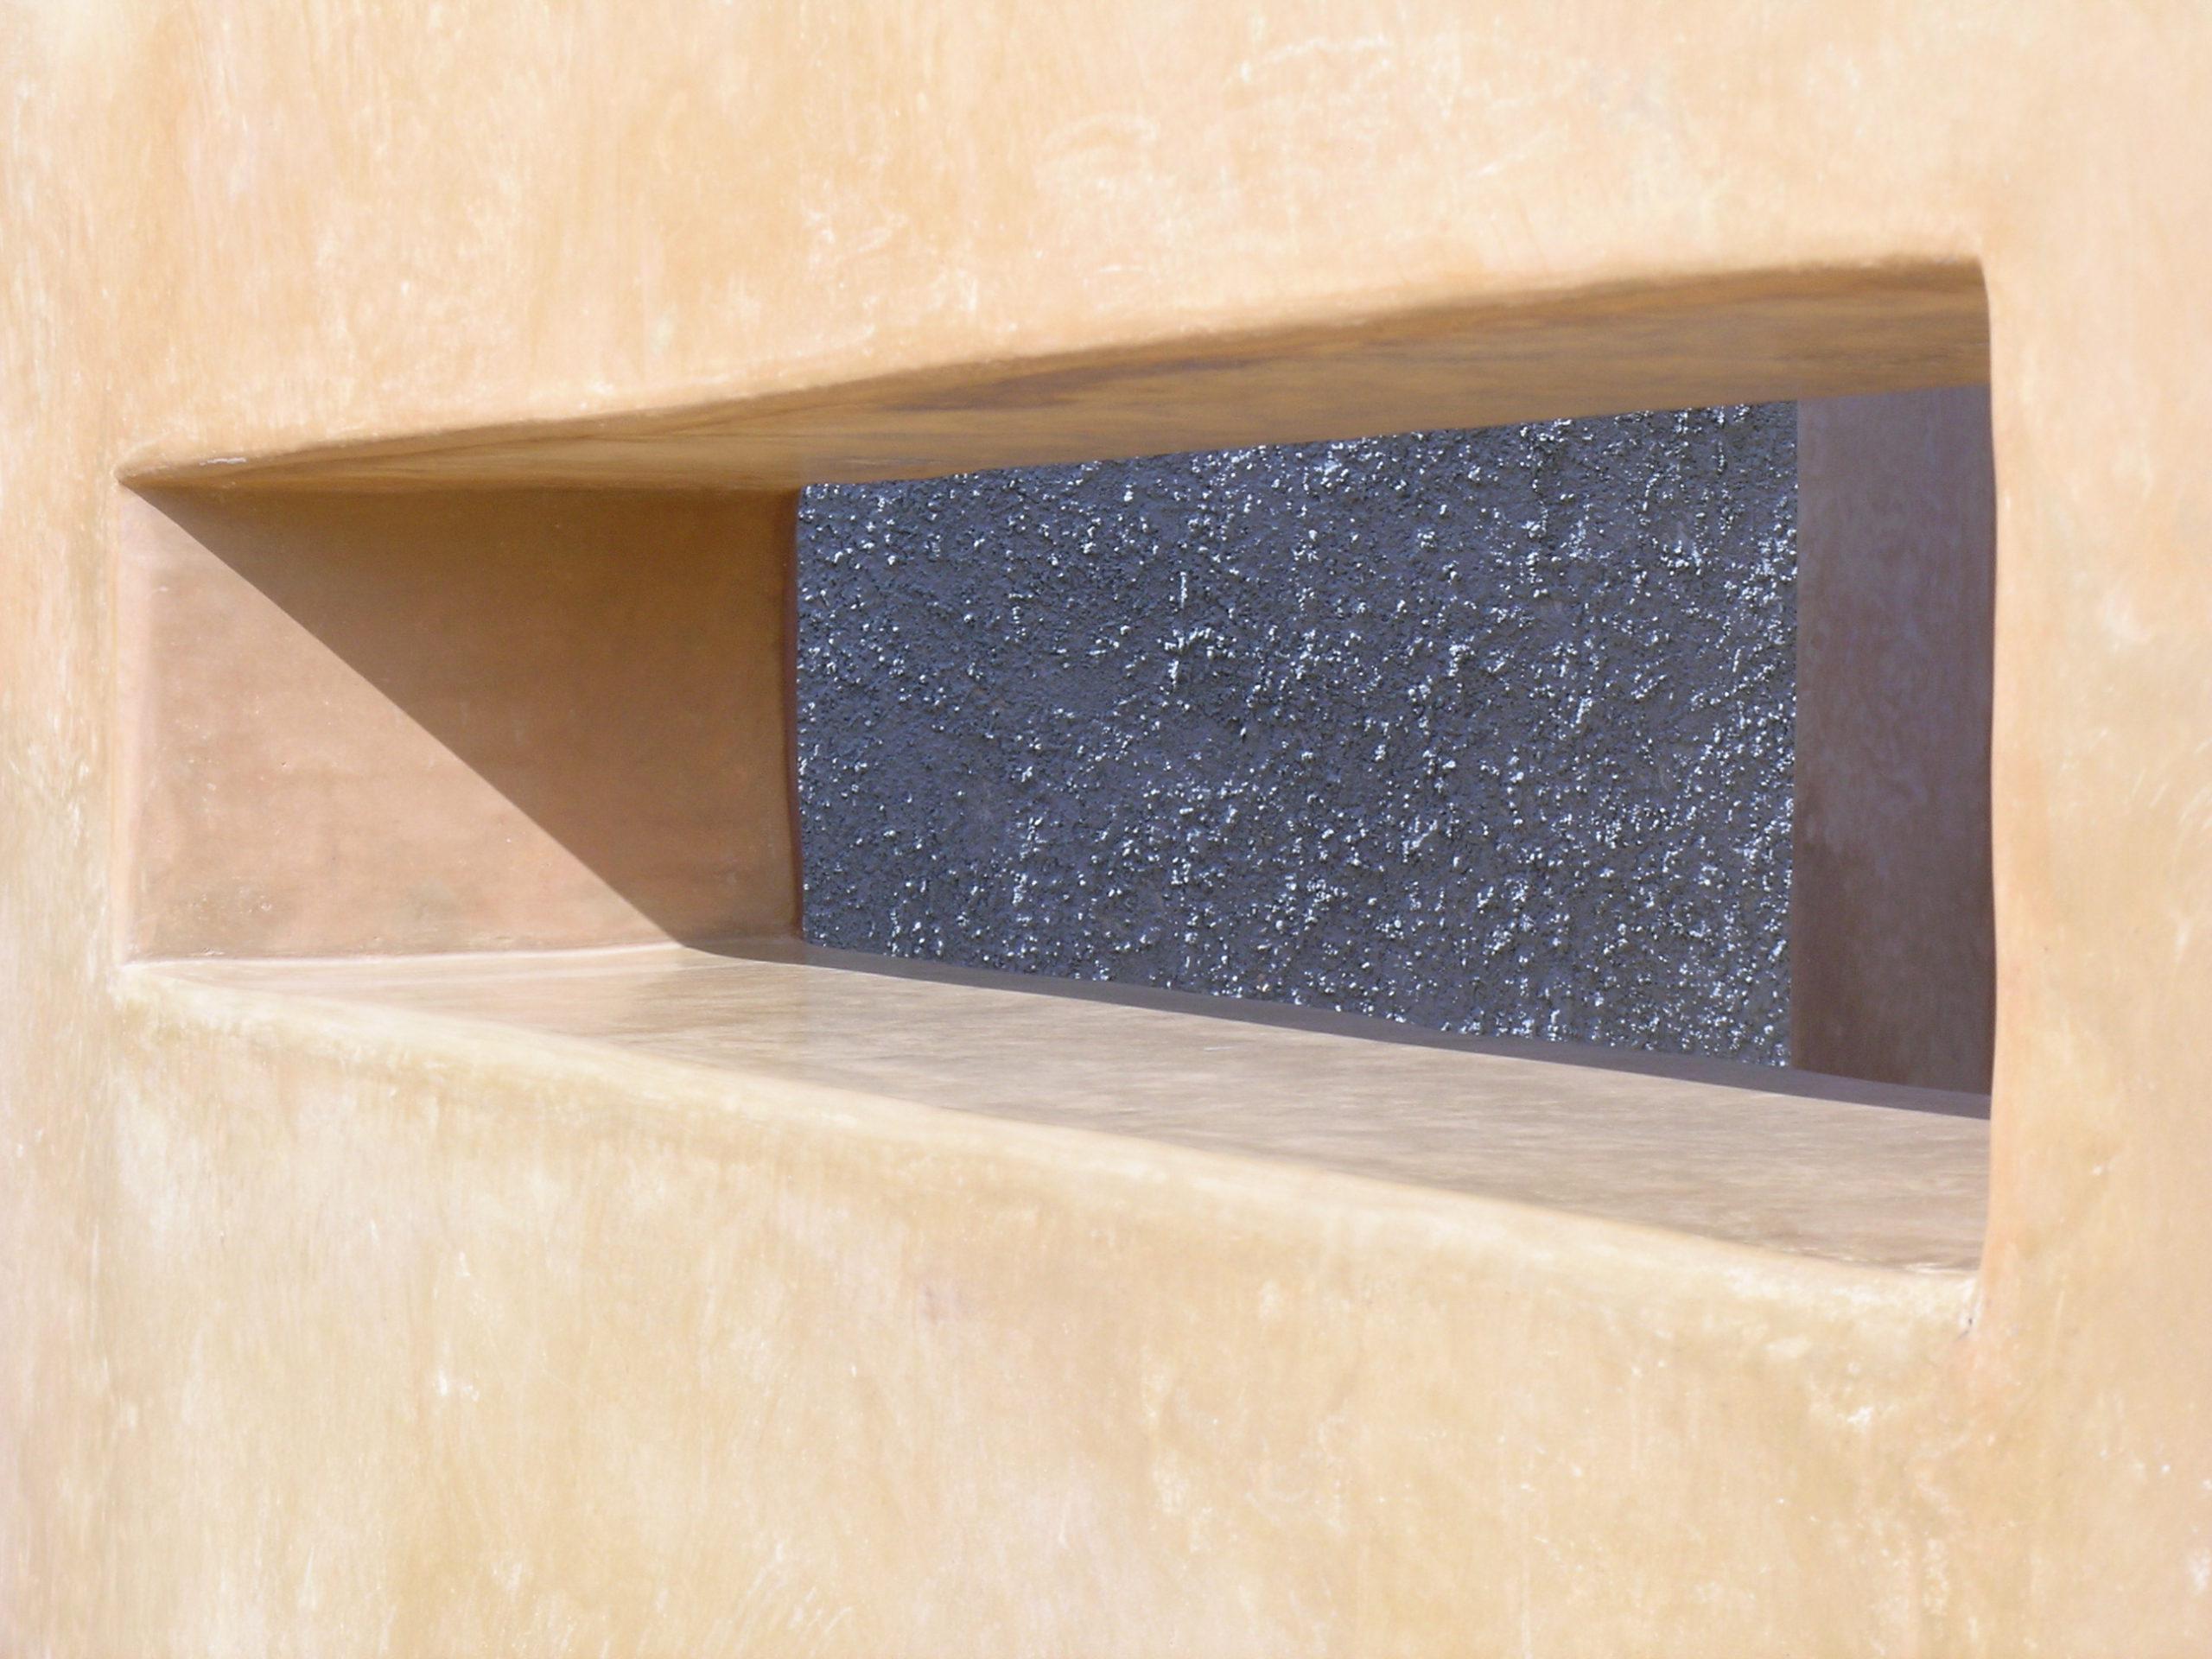 Kalkmortel kalkpleister kalkstuc buiten